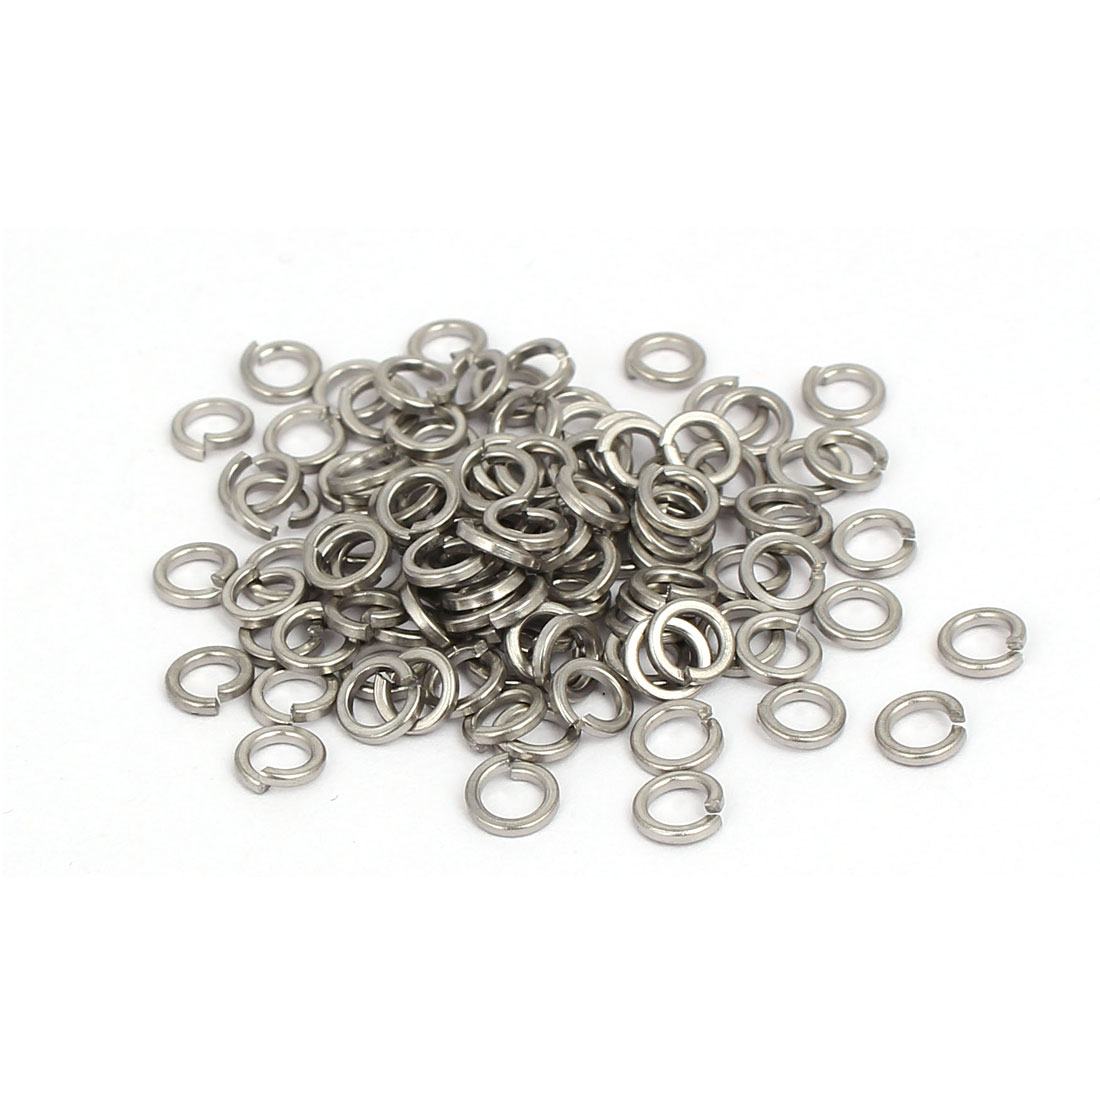 M3 Inner Diameter 316 Stainless Steel Split Lock Spring Washers Gasket 100pcs